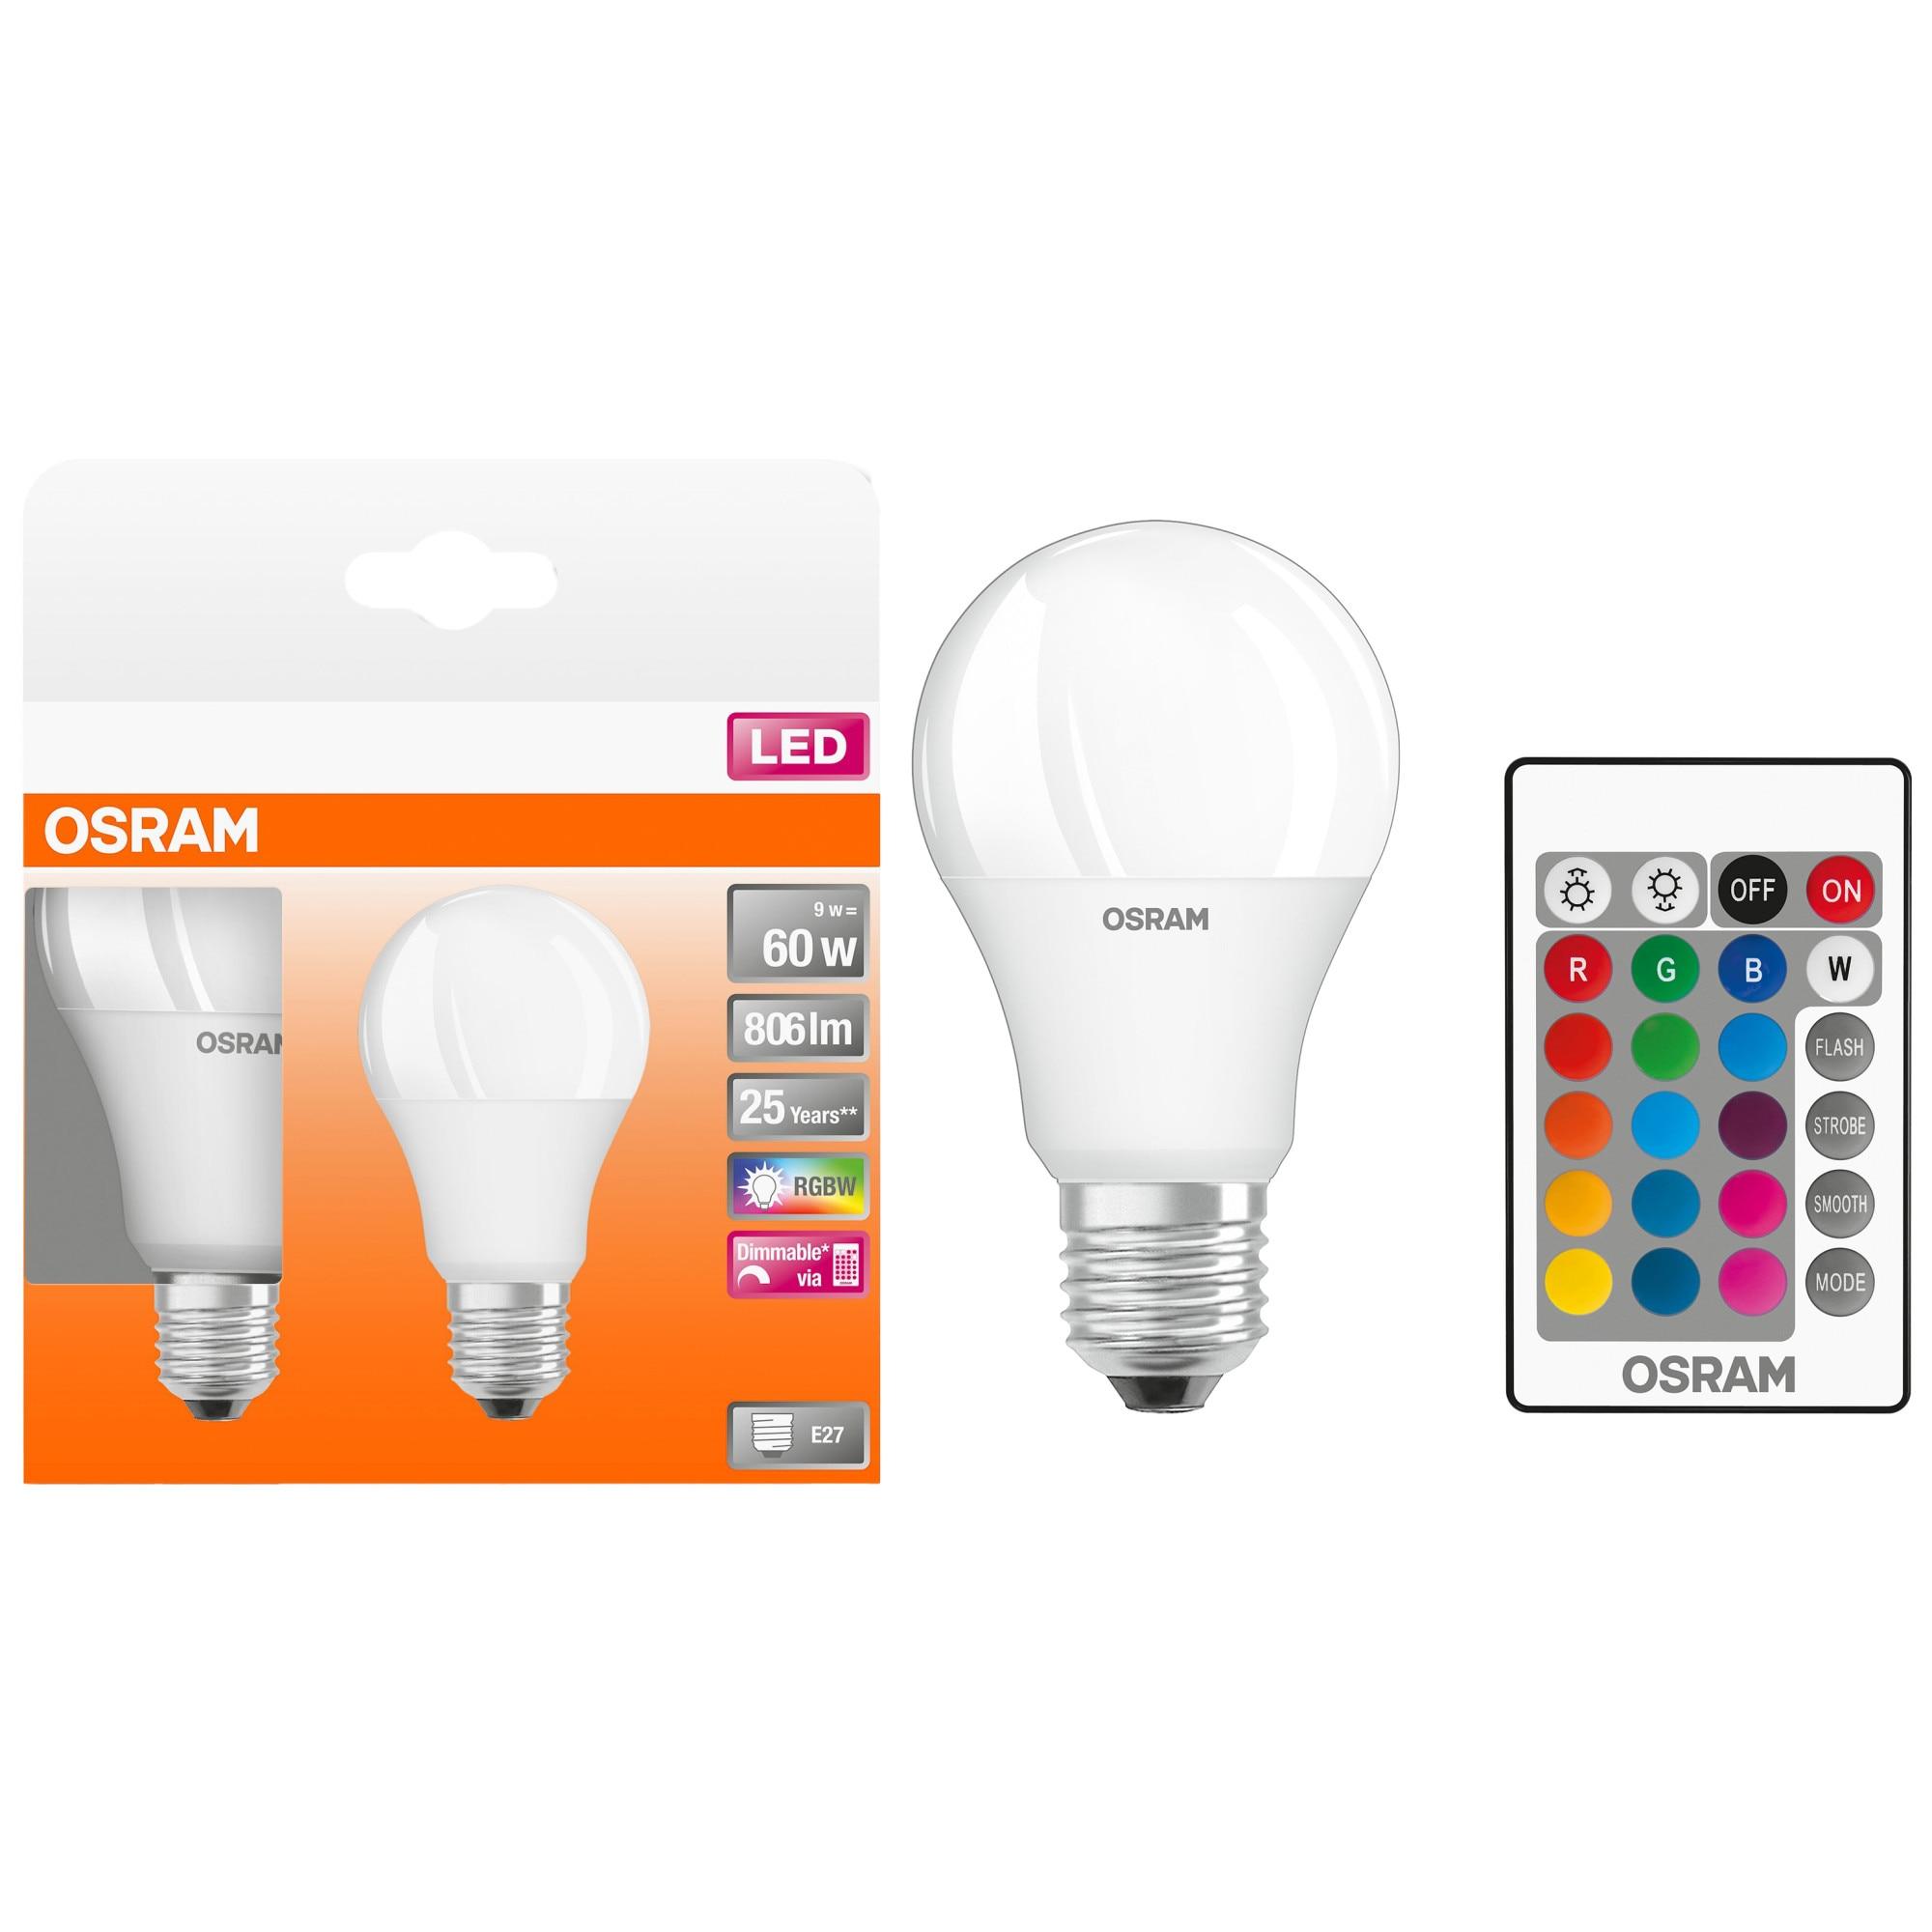 Fotografie Set 2 becuri LED RGB-W Osram Star, E27, 9W (60W), 806 lm, dimabil, telecomanda inclusa, A+, lumina alba si colorata